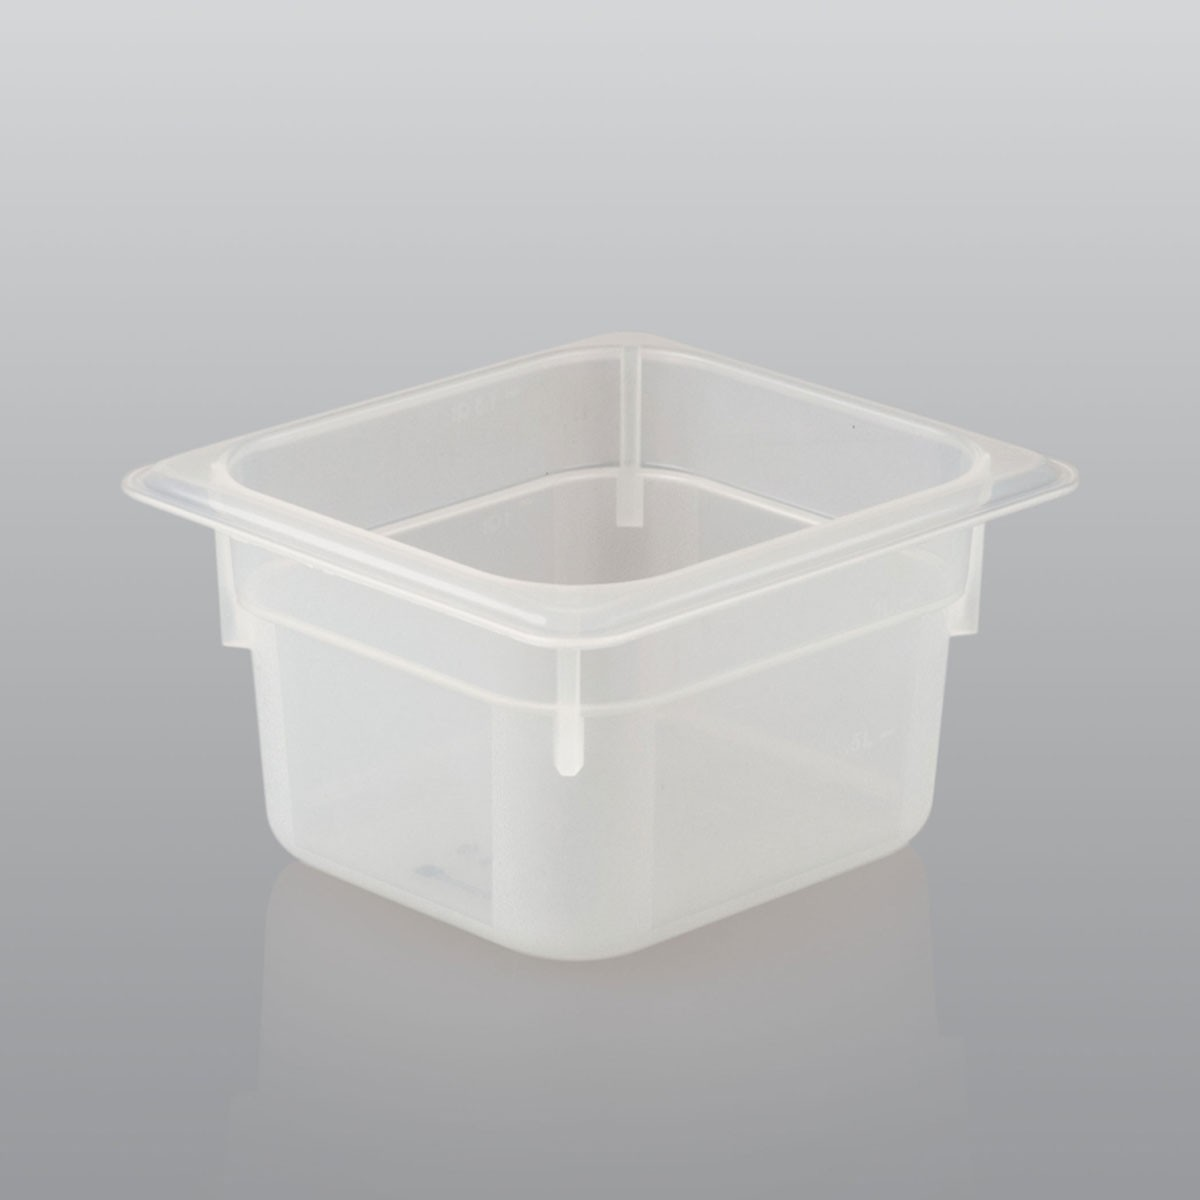 GN Behälter GN 1/6 aus Polypropylen (Tiefe: 100mm) 1,6 L Saro